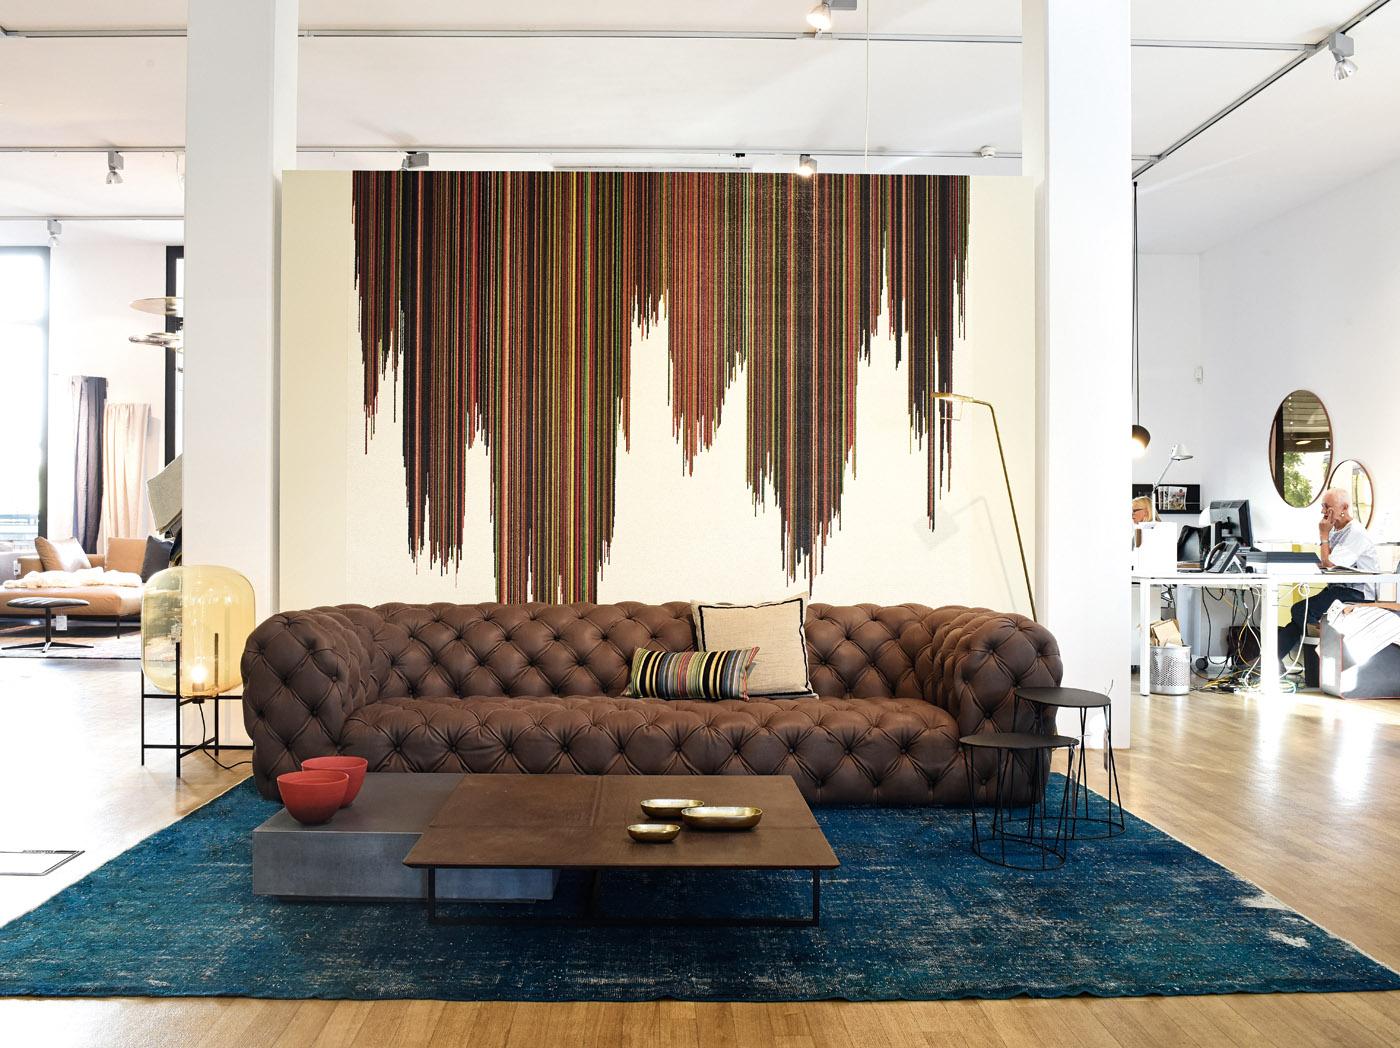 Reim Wohndesign By Bsk Büro